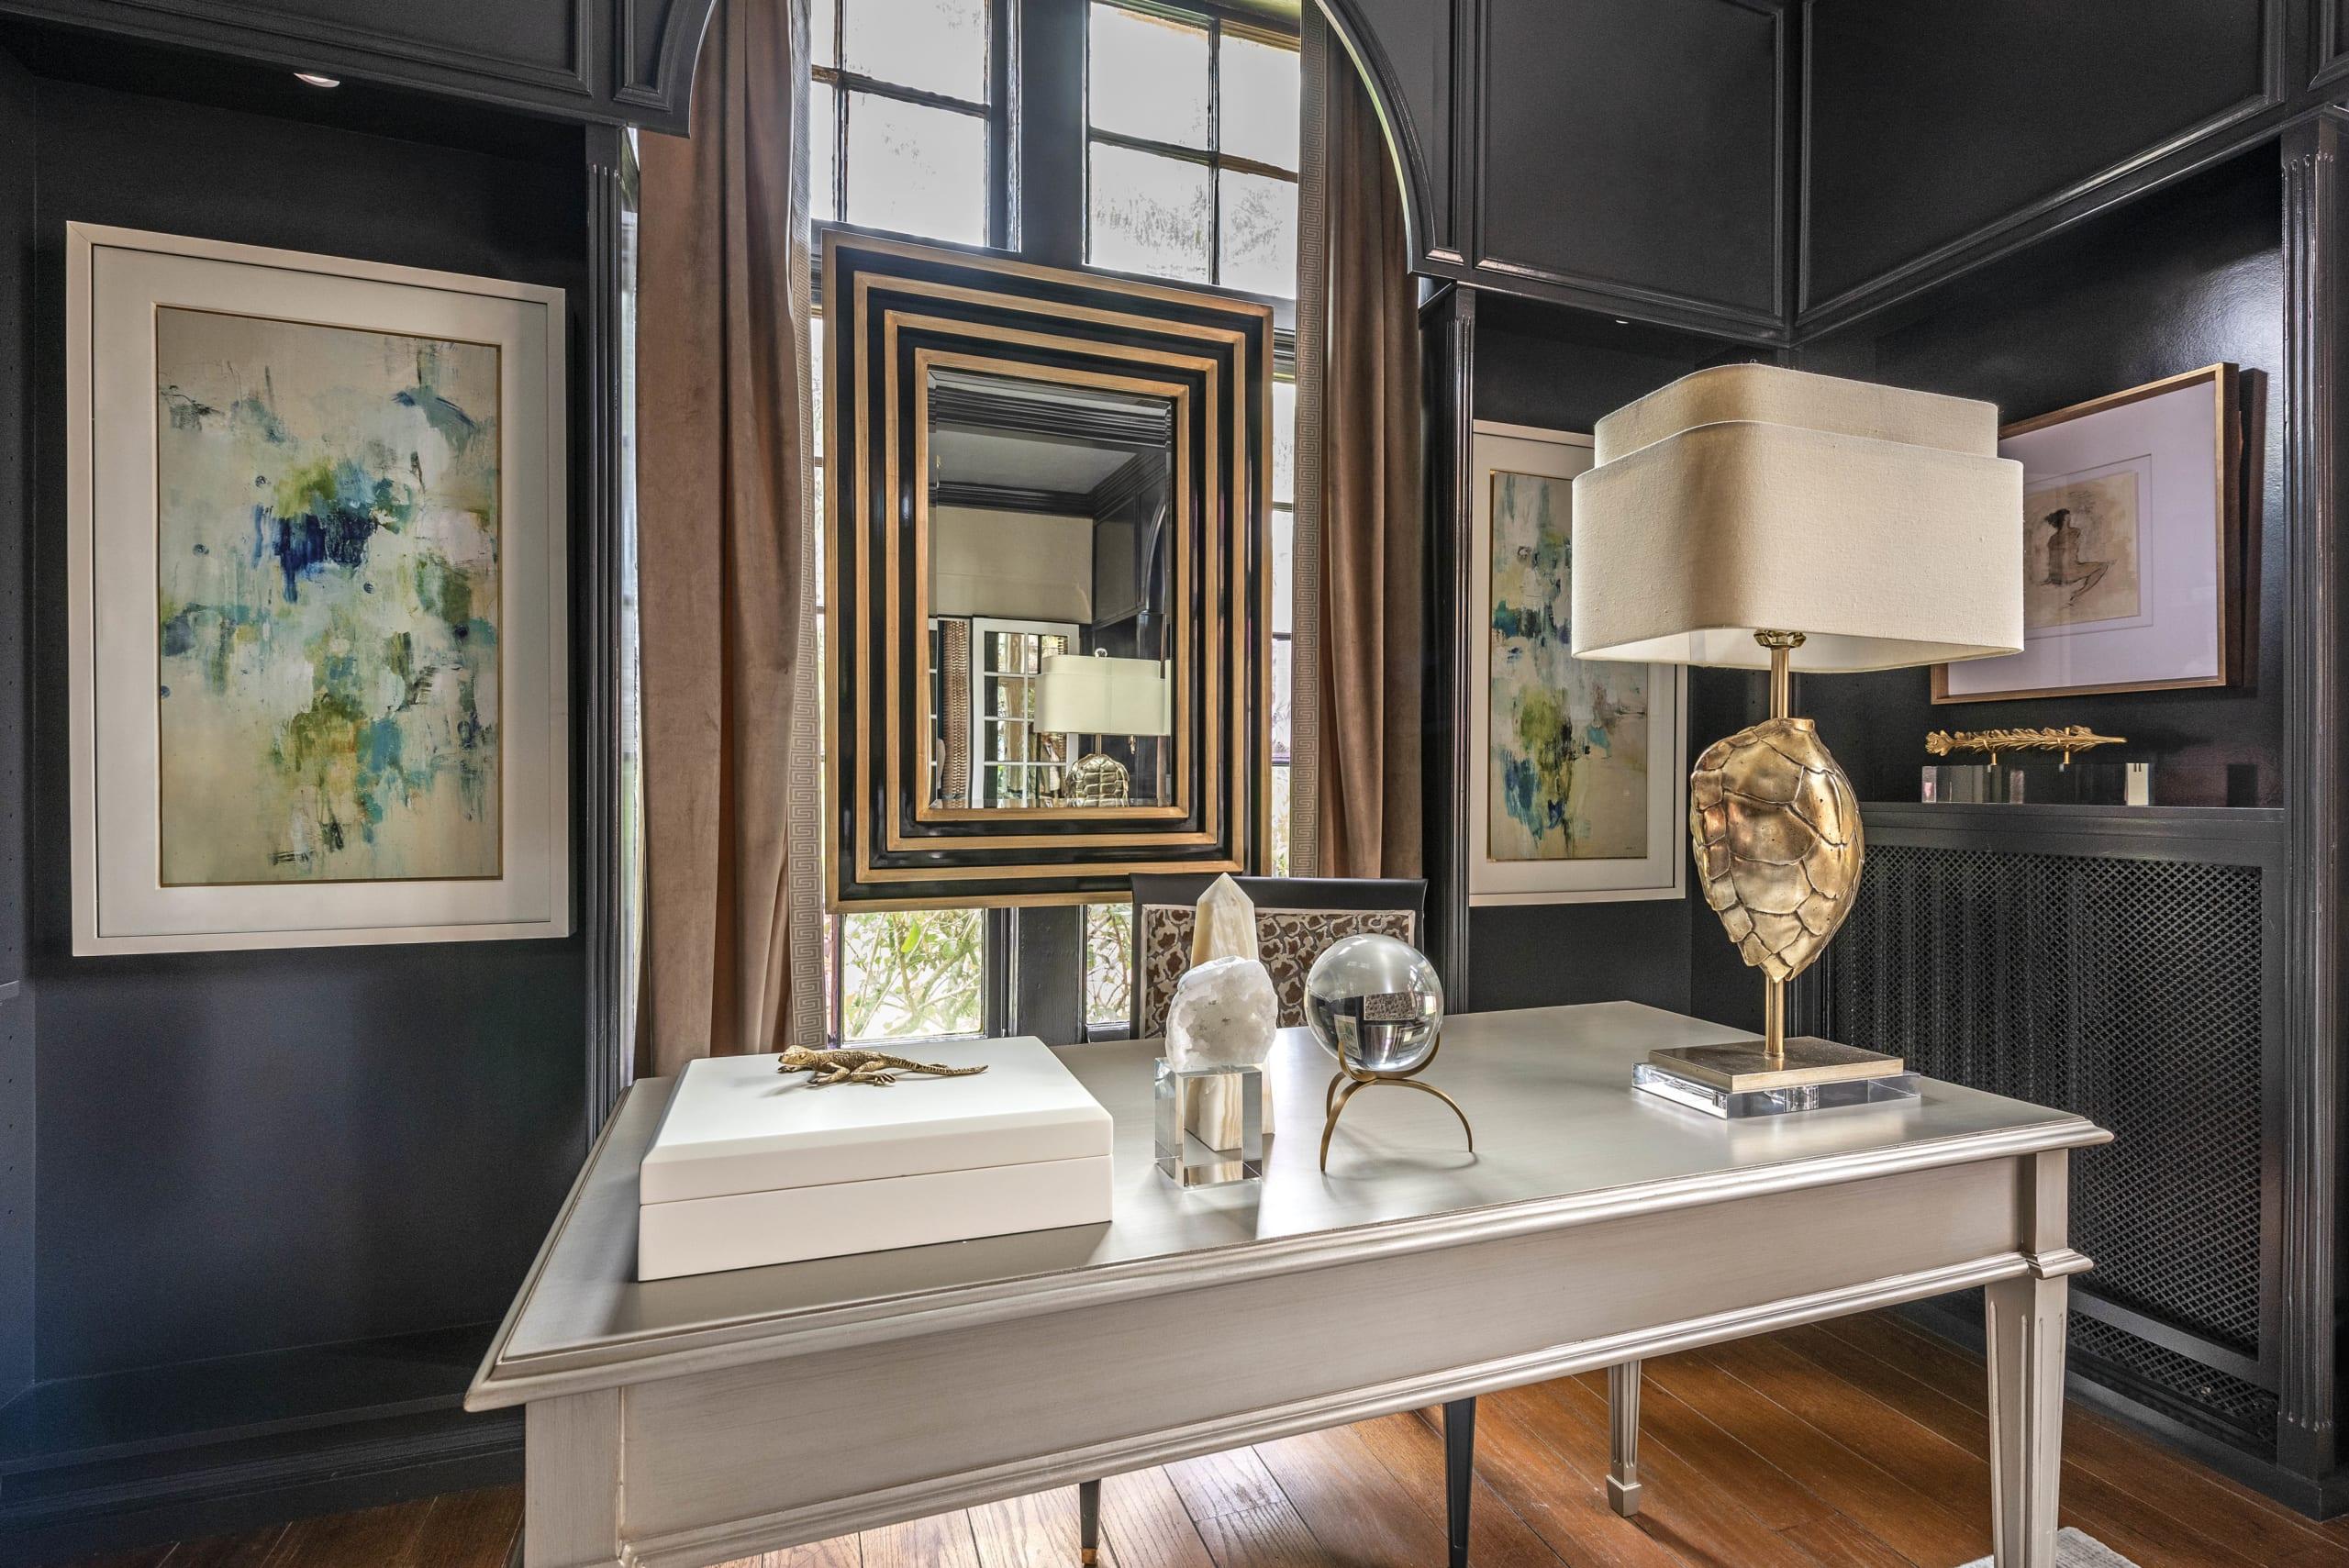 Kristin Pantone Black Interior Office Table Gold Turtle Lamp